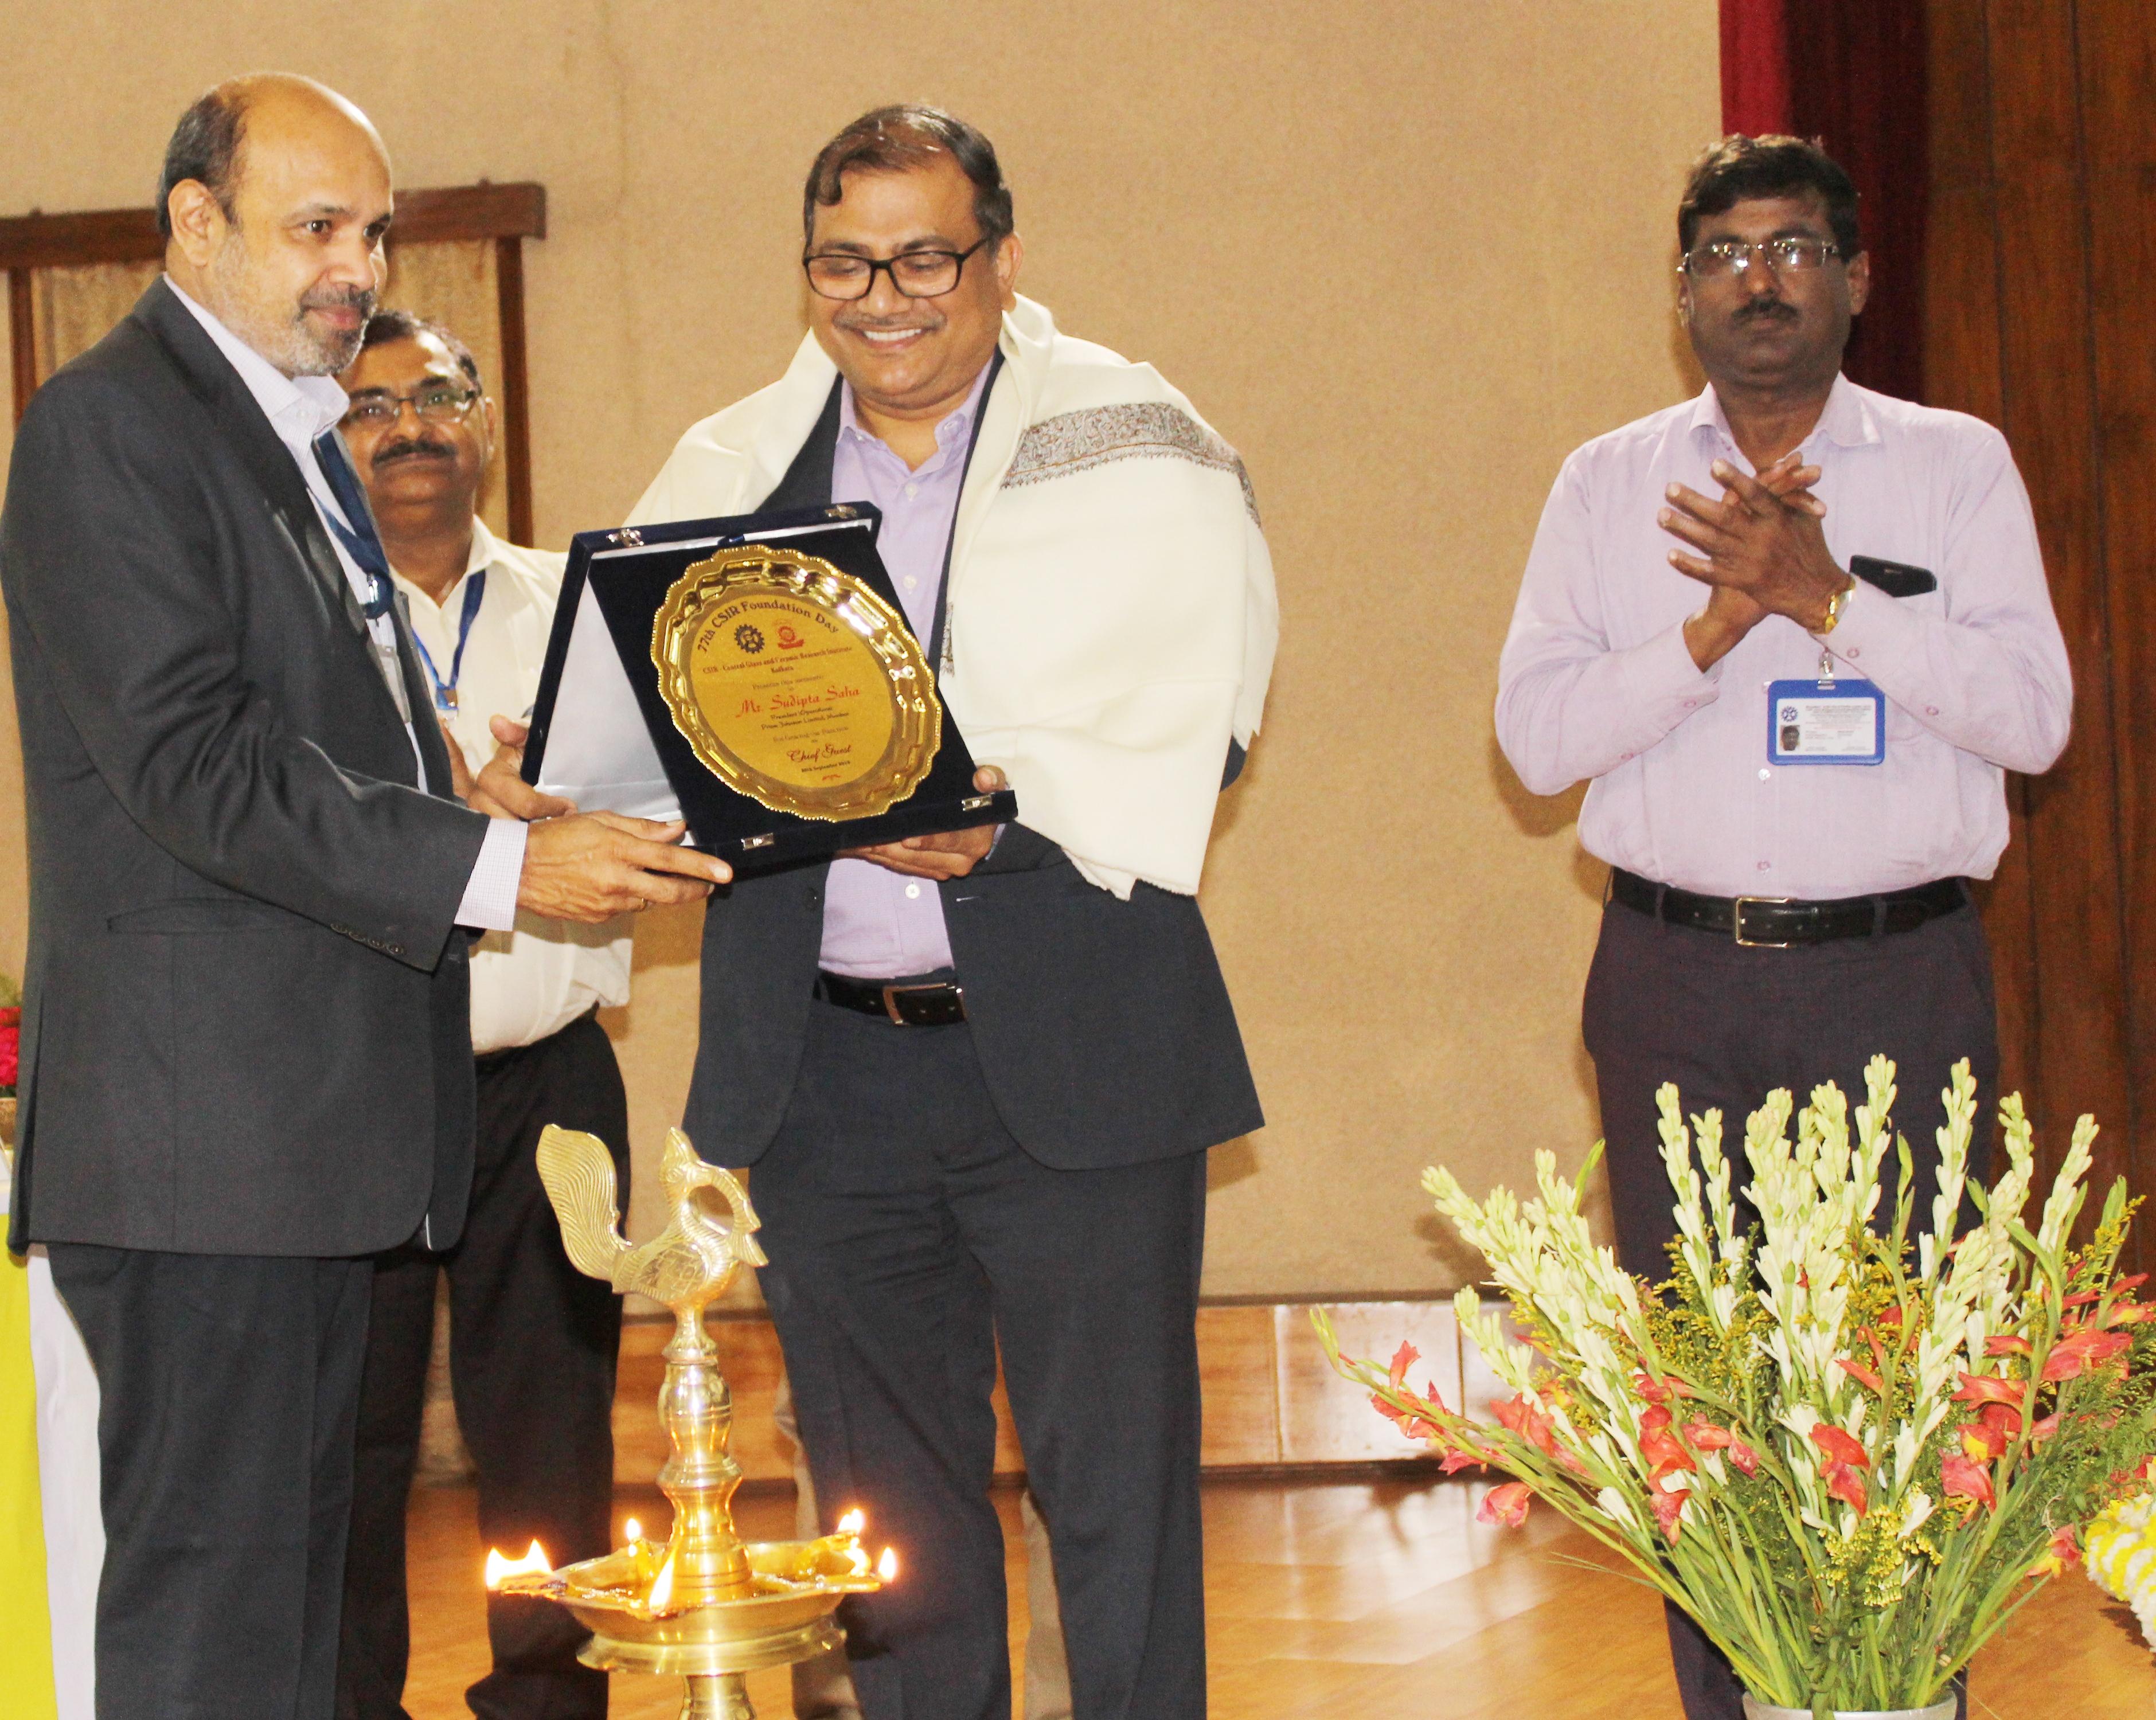 78th CSIR Foundation Day Celebration of CSIR - Felicitation of Shri Sudipta Saha, Chief Guest (2) - Copy